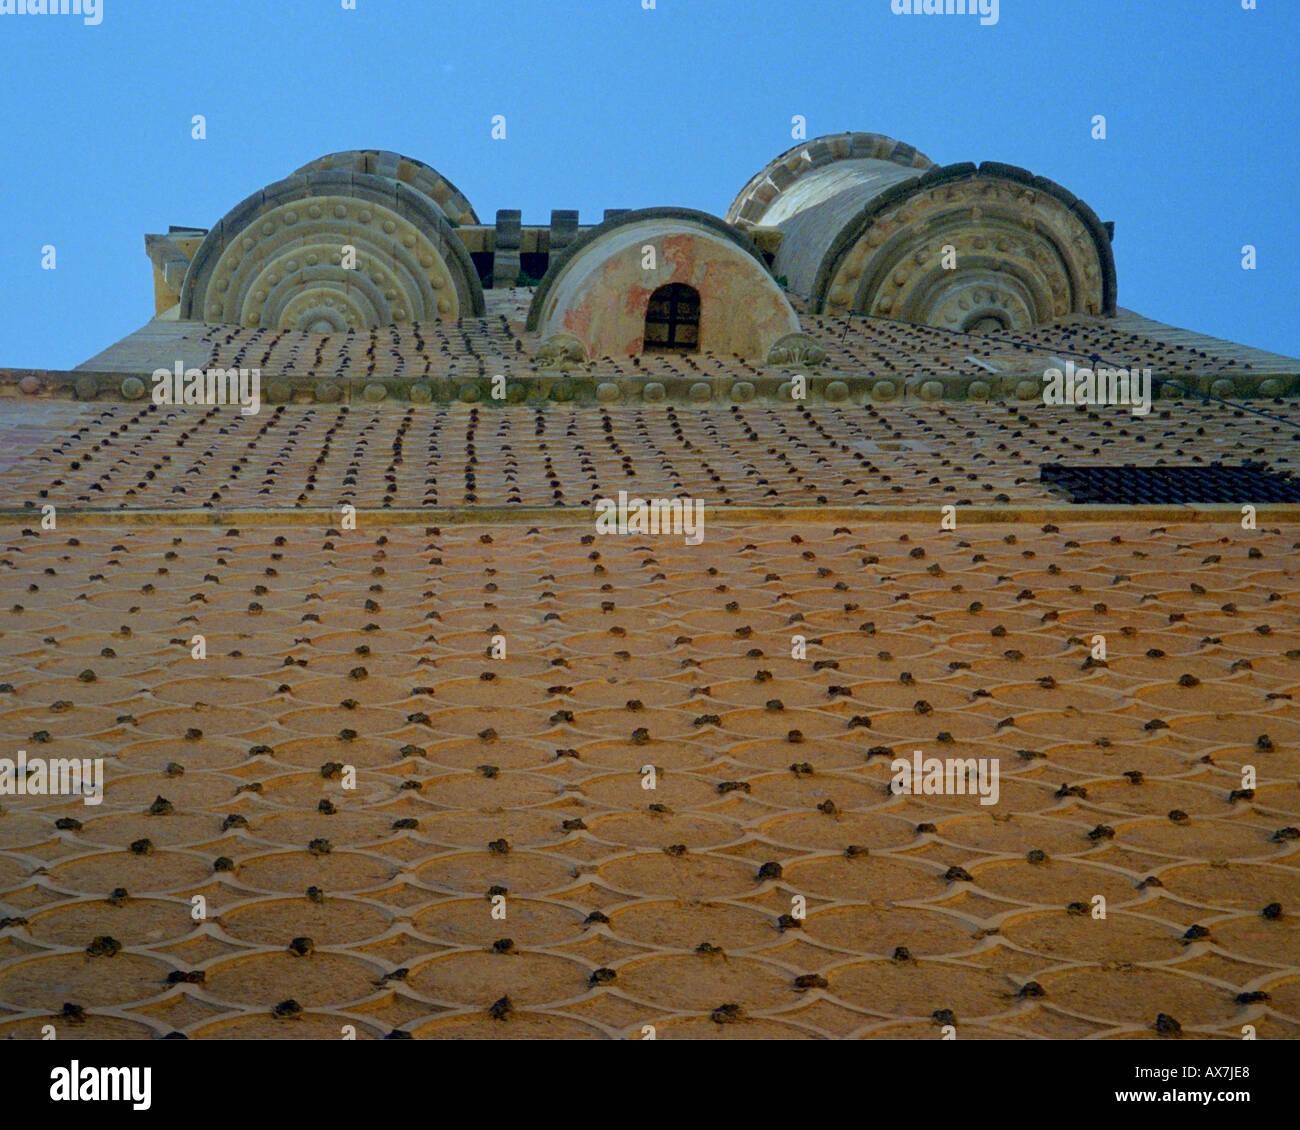 Außenwand des Alcazar Segovia in Spanien Stockfoto